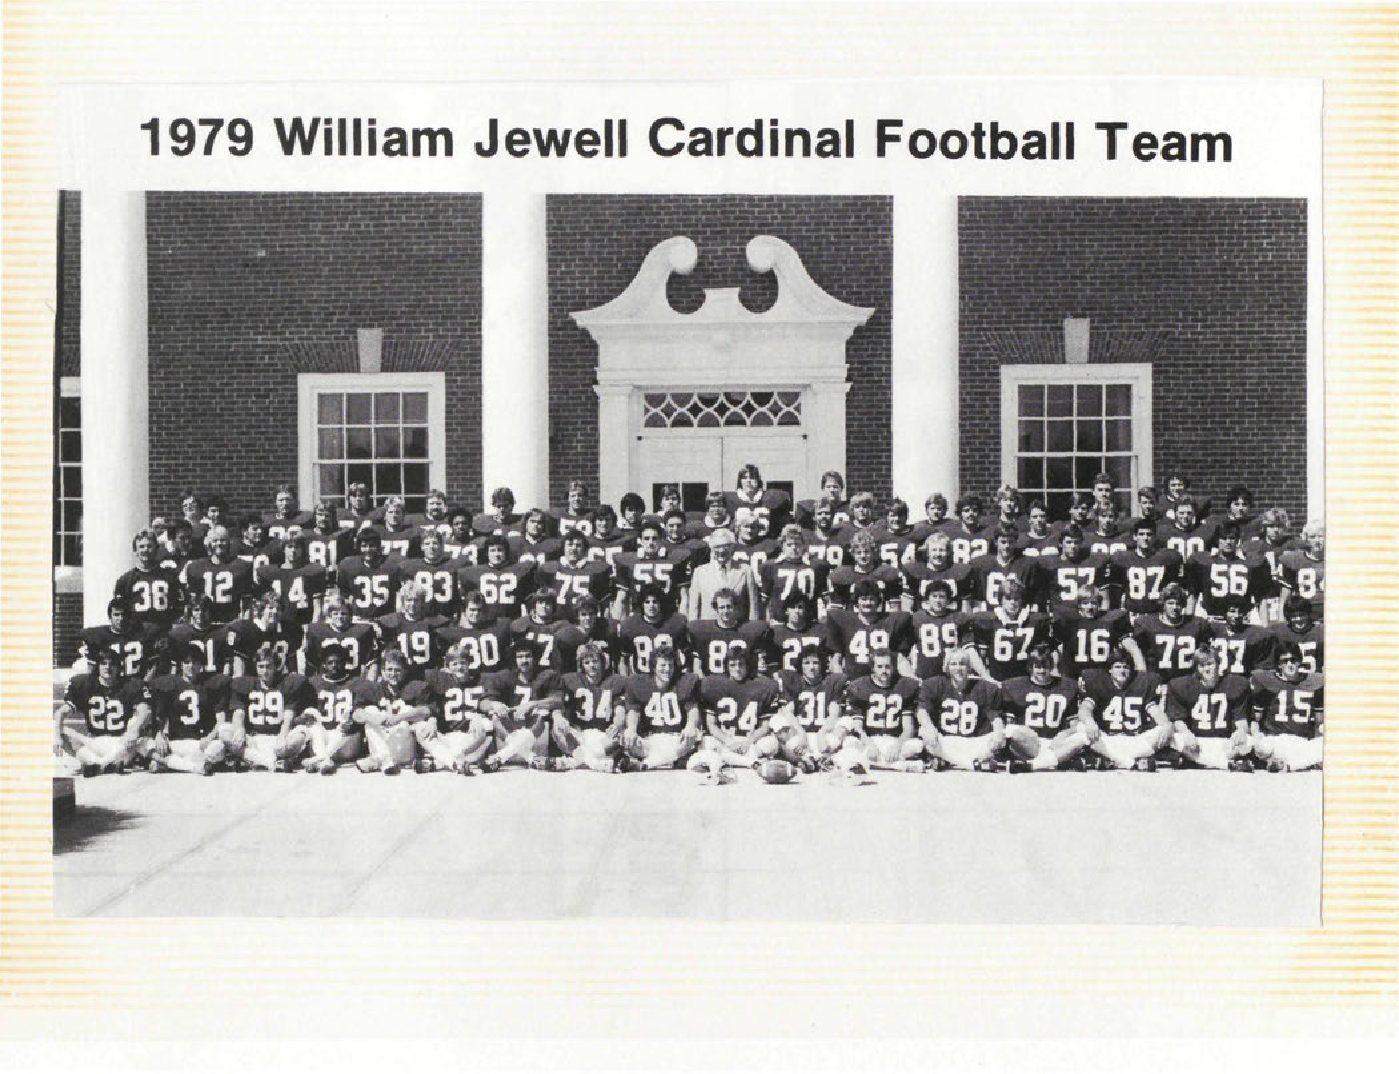 wjc-football-roster-1979